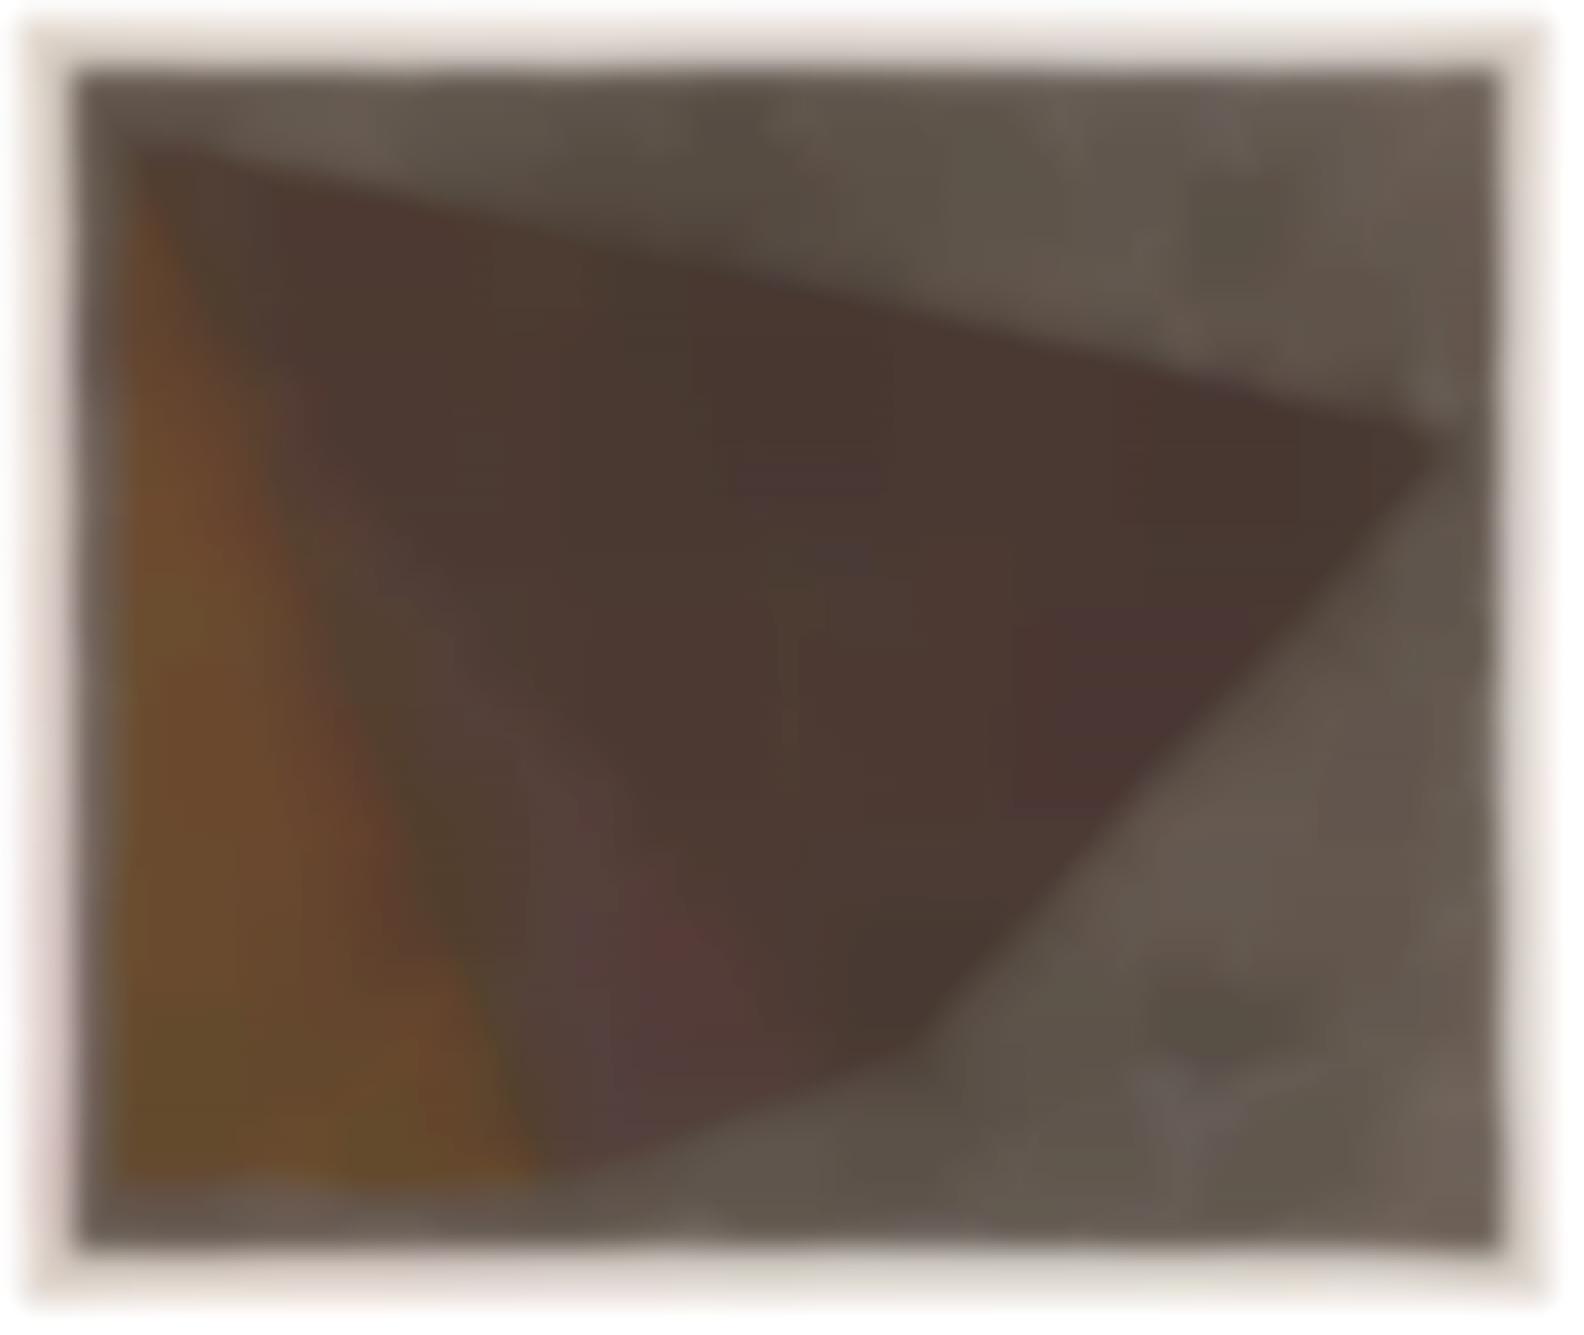 Sol LeWitt-Pyramid-1985